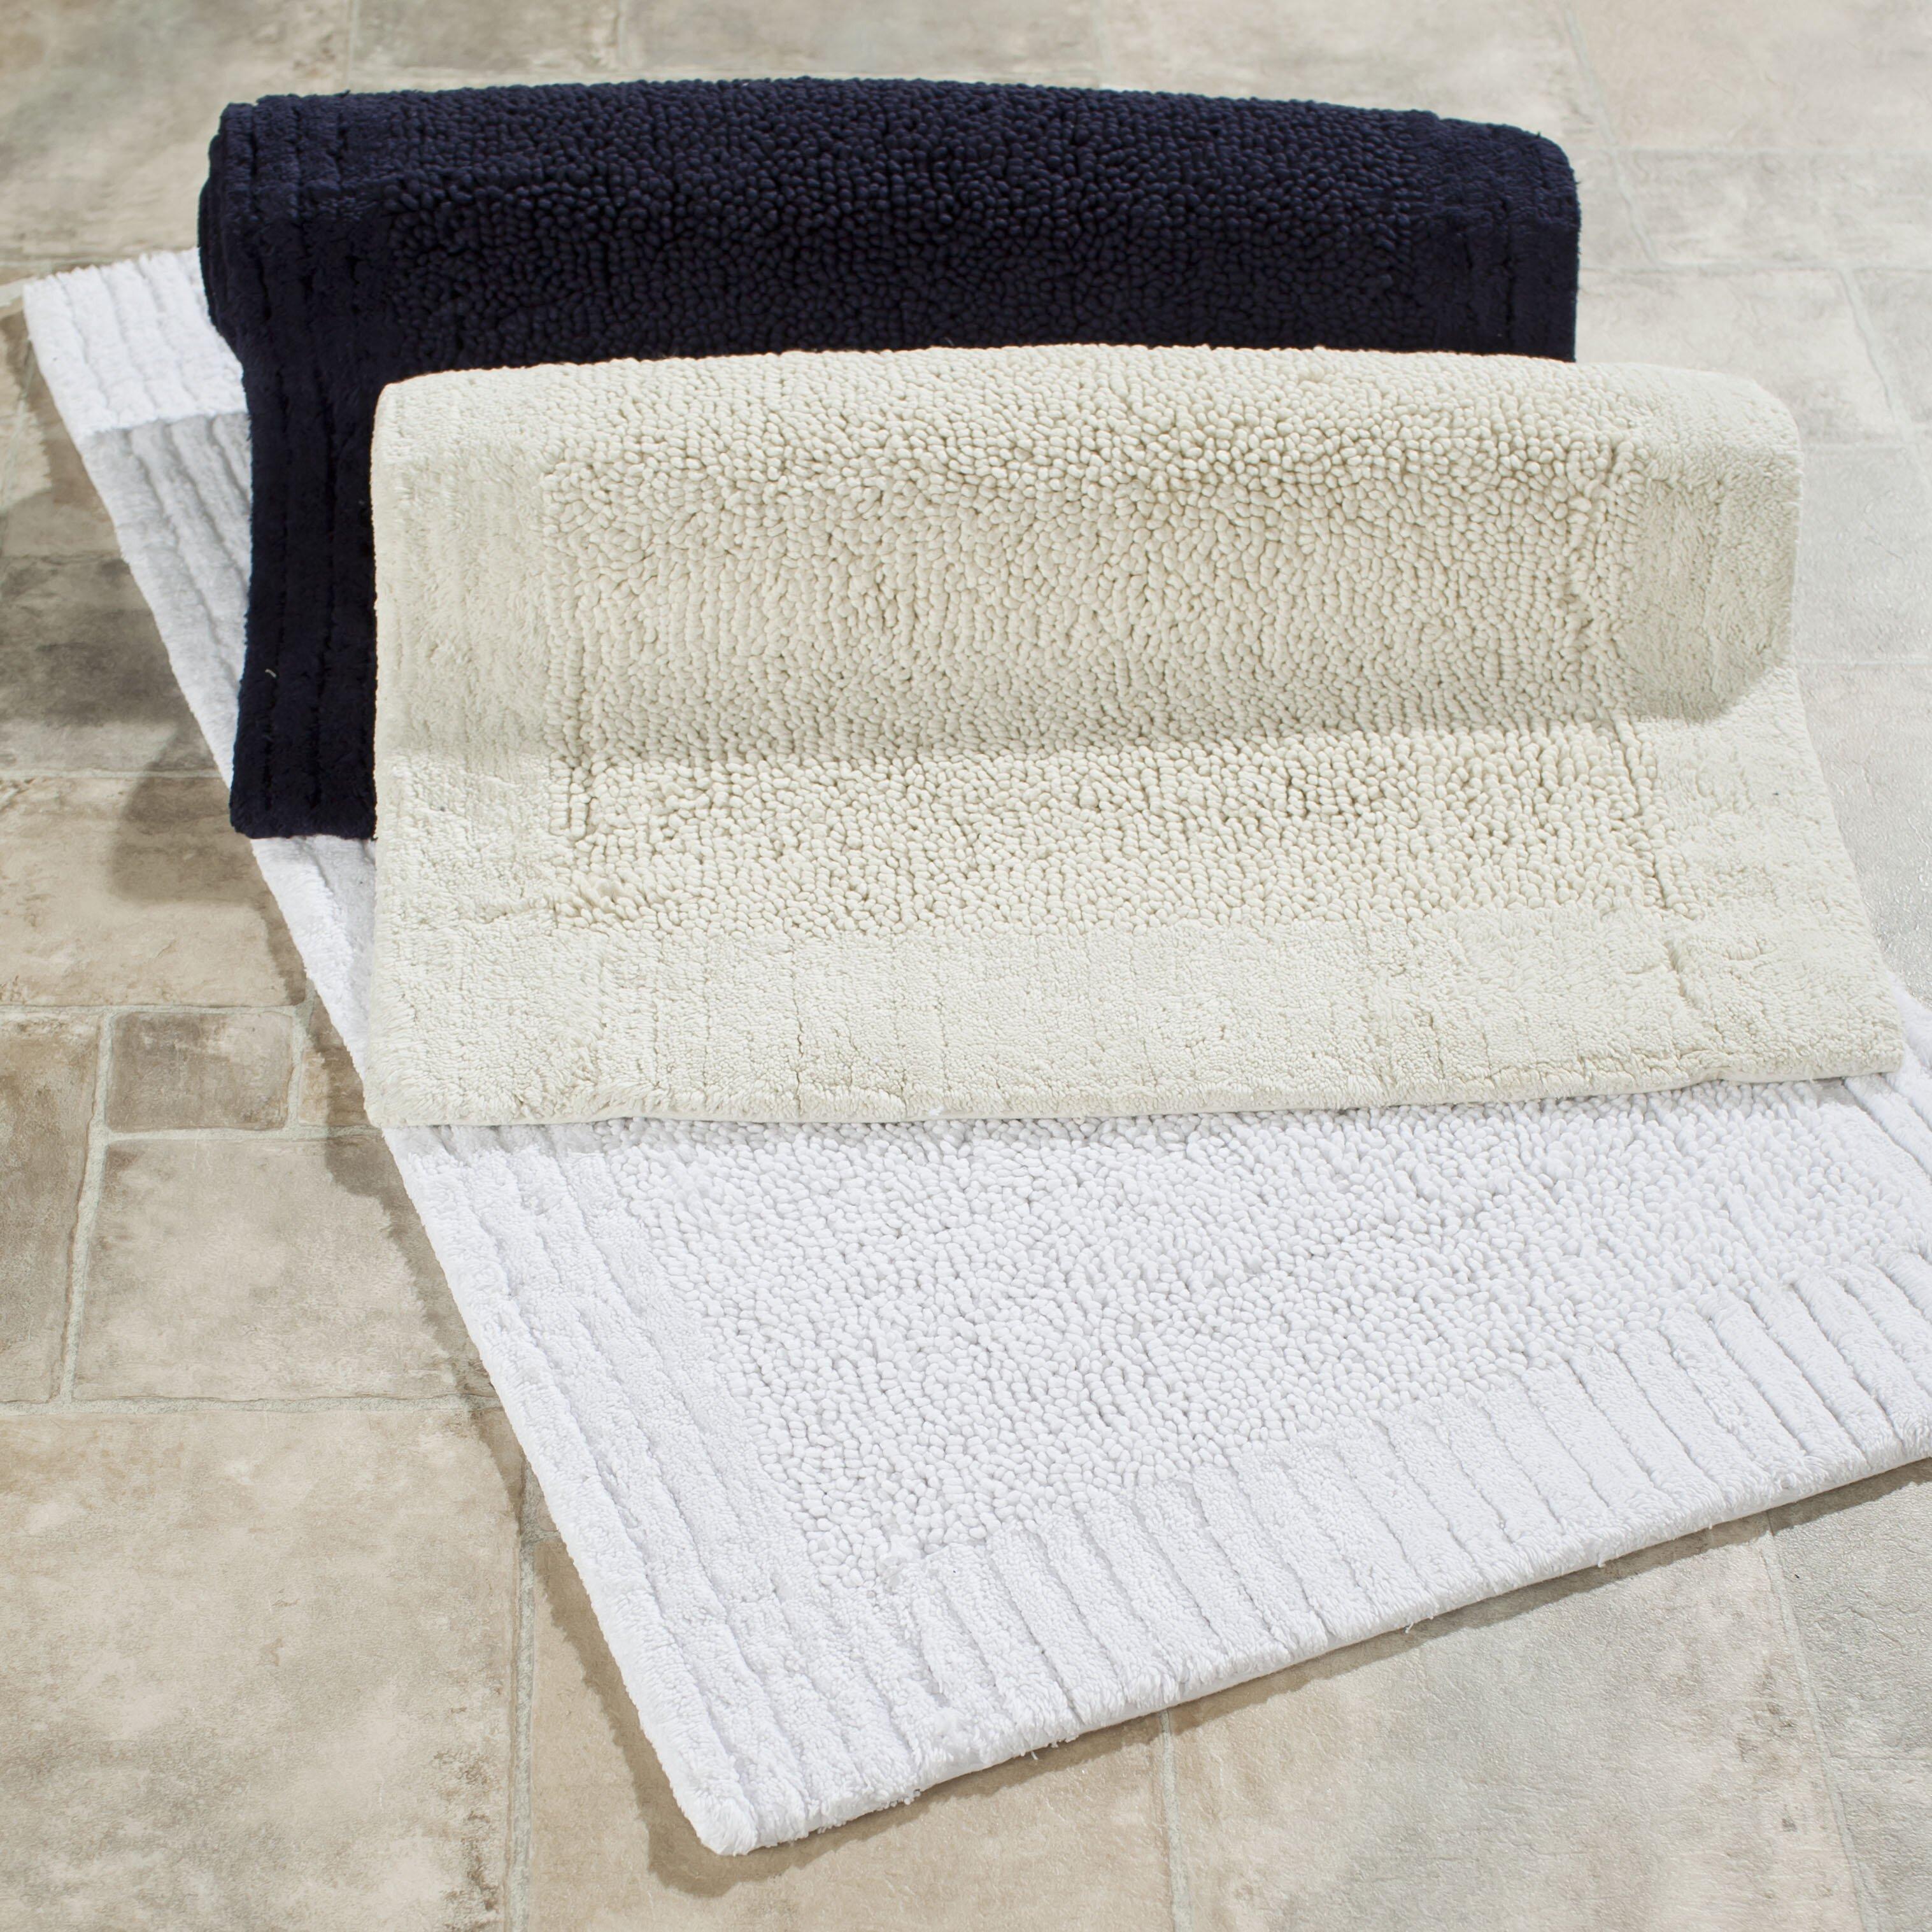 Plush Bathroom Rugs Safavieh Plush Master Bath Rug Ii Reviews Wayfair